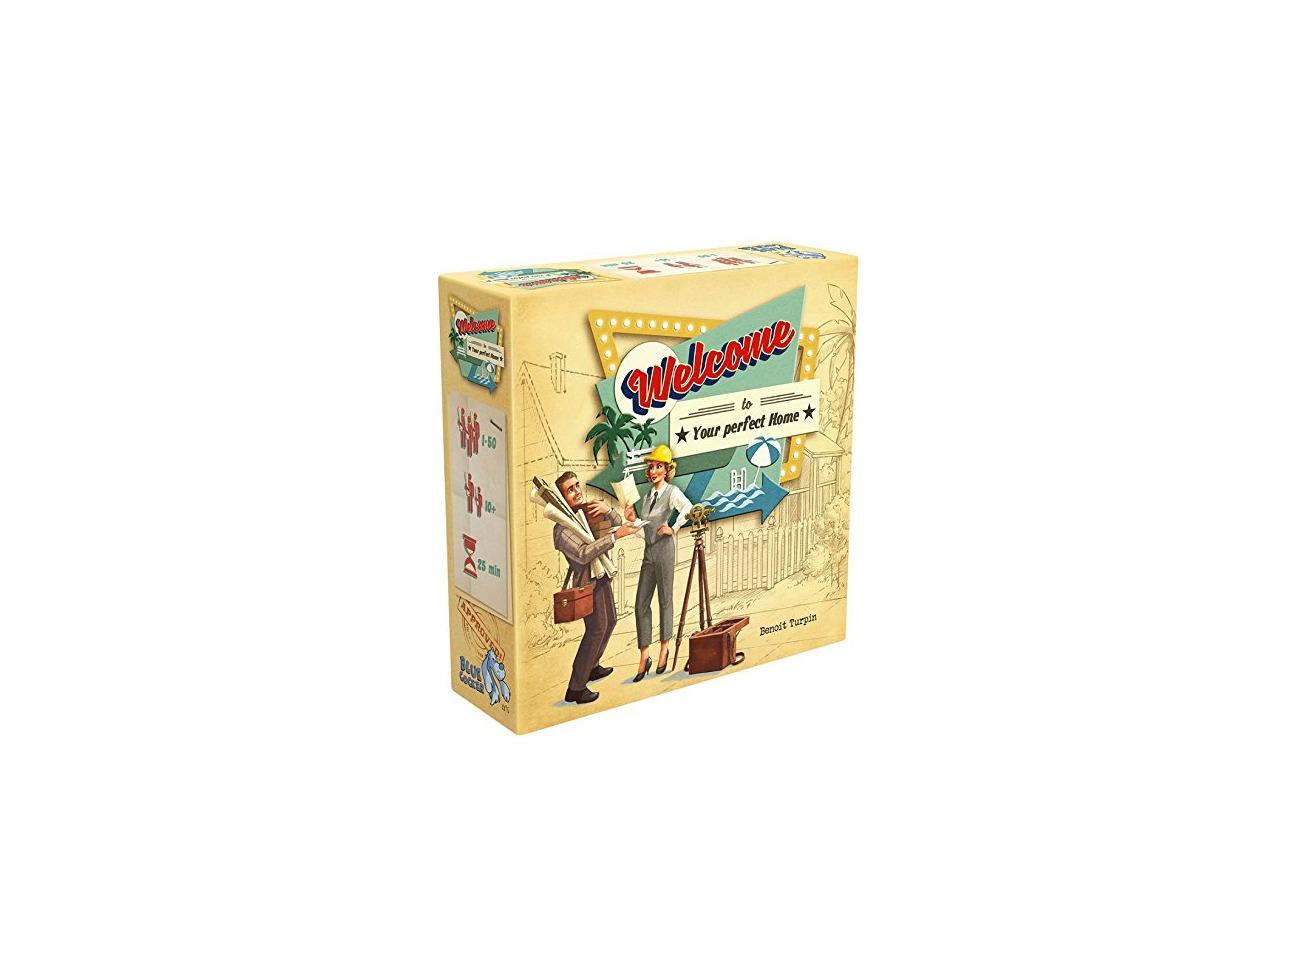 FATMOOSE EasyFix Grundanker 8er-Set Schaukelanker Erdanker Spielturm Zubehör